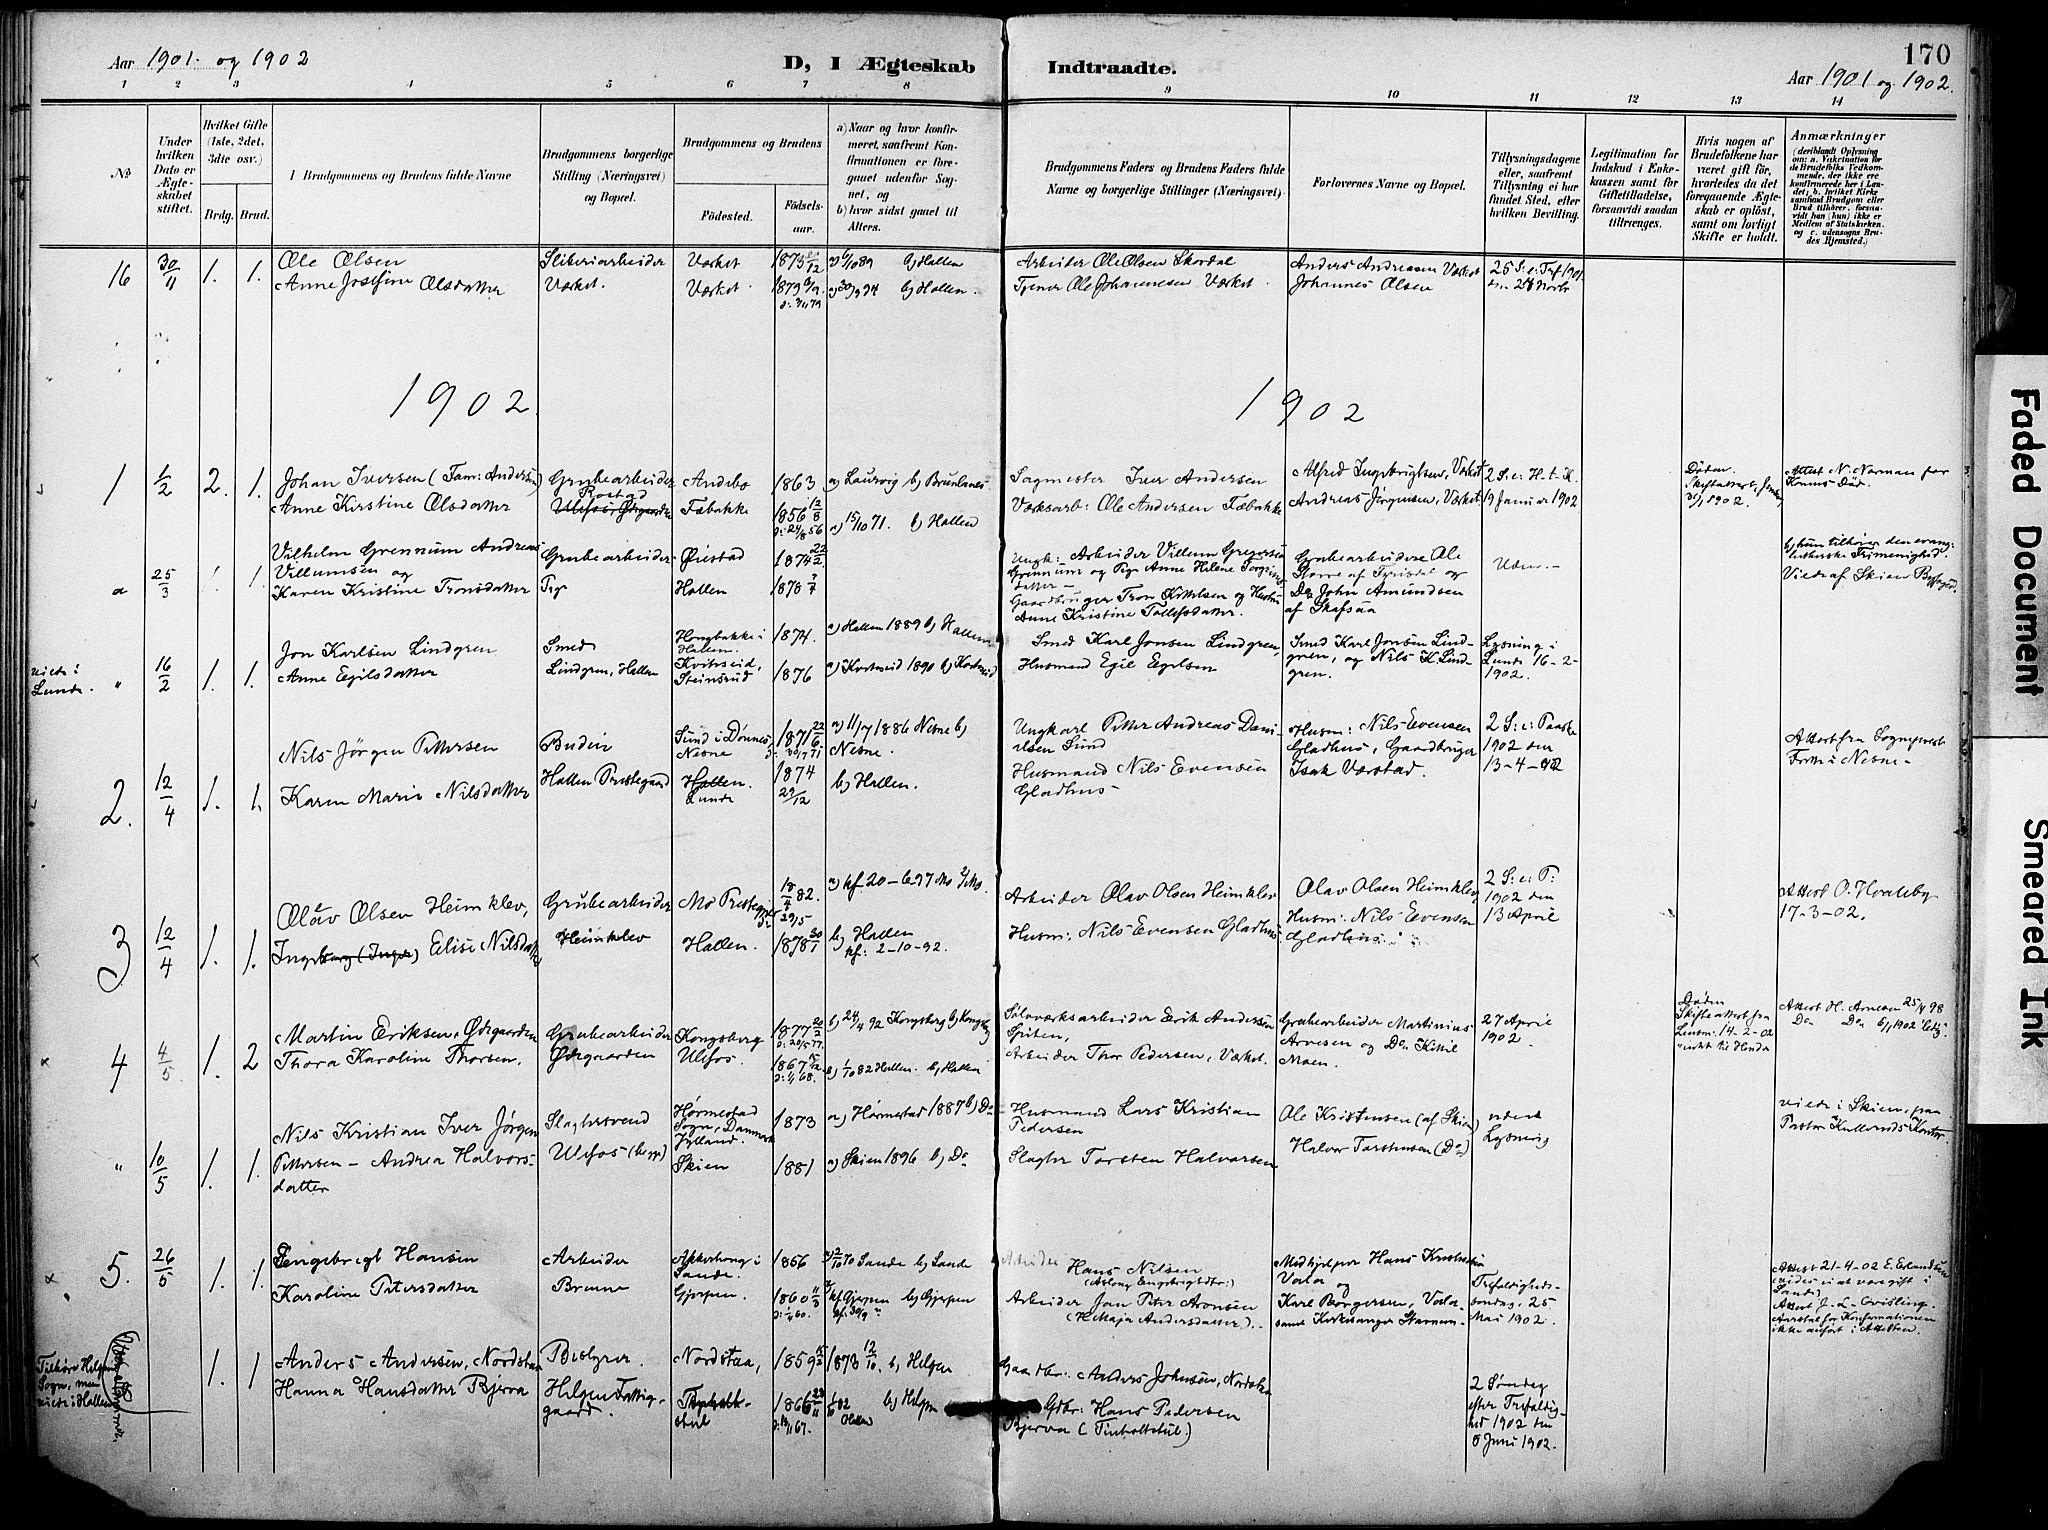 SAKO, Holla kirkebøker, F/Fa/L0010: Ministerialbok nr. 10, 1897-1907, s. 170